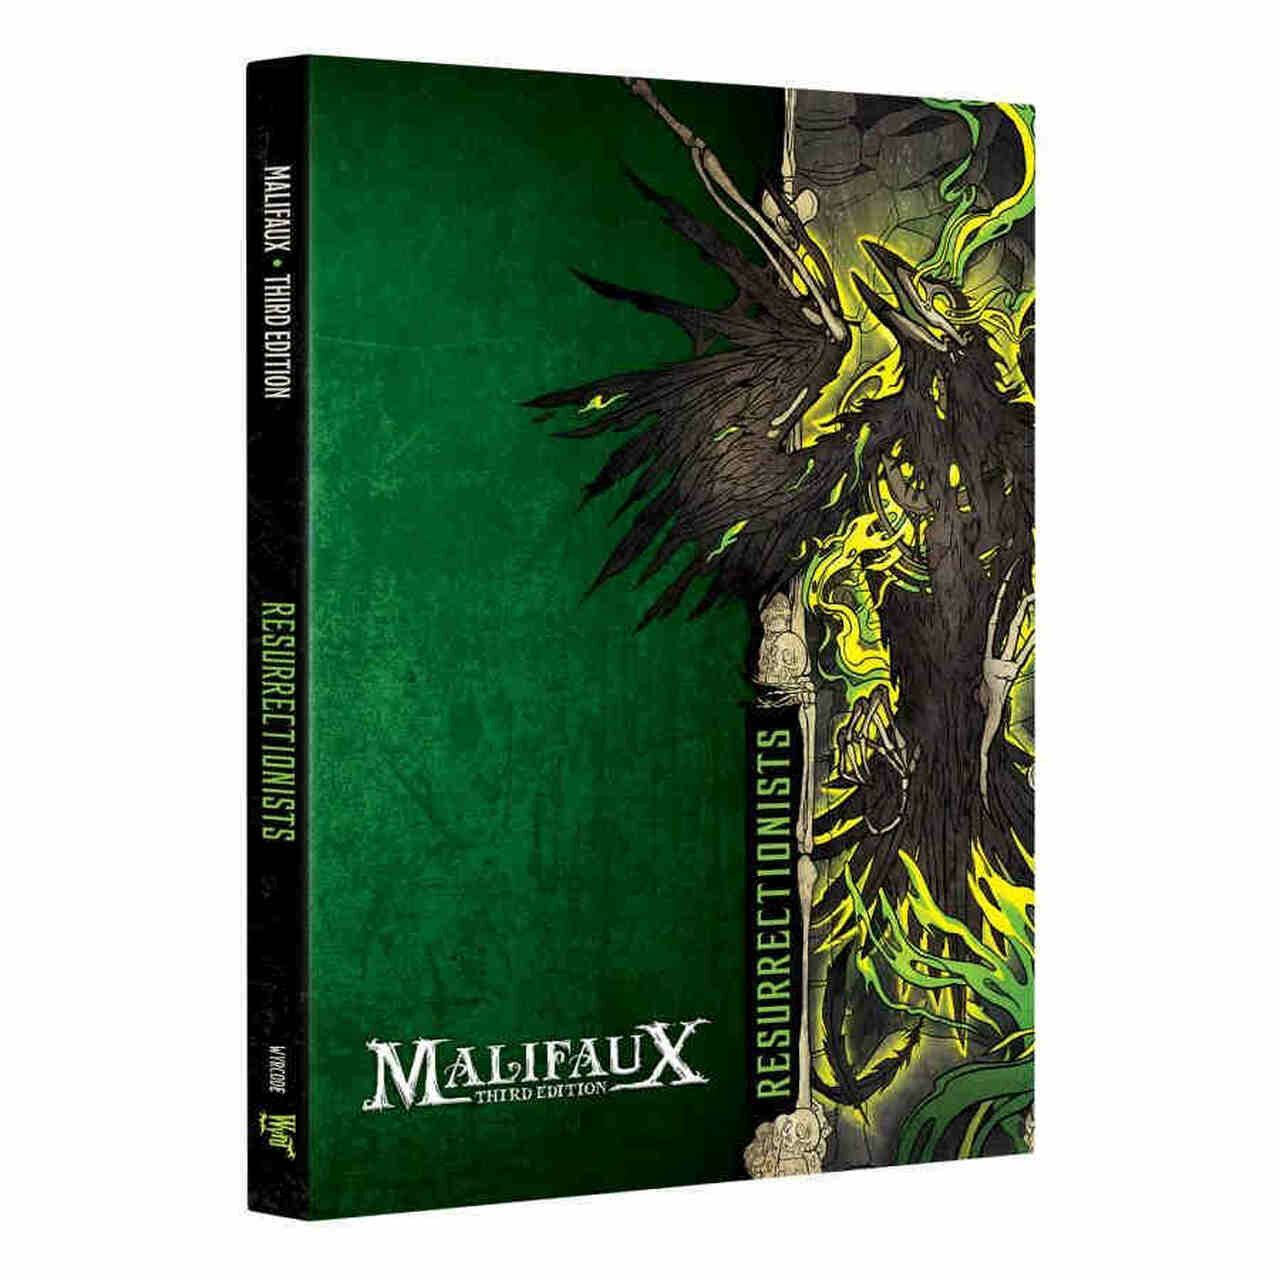 Malifaux 3E Resurrectionists Book